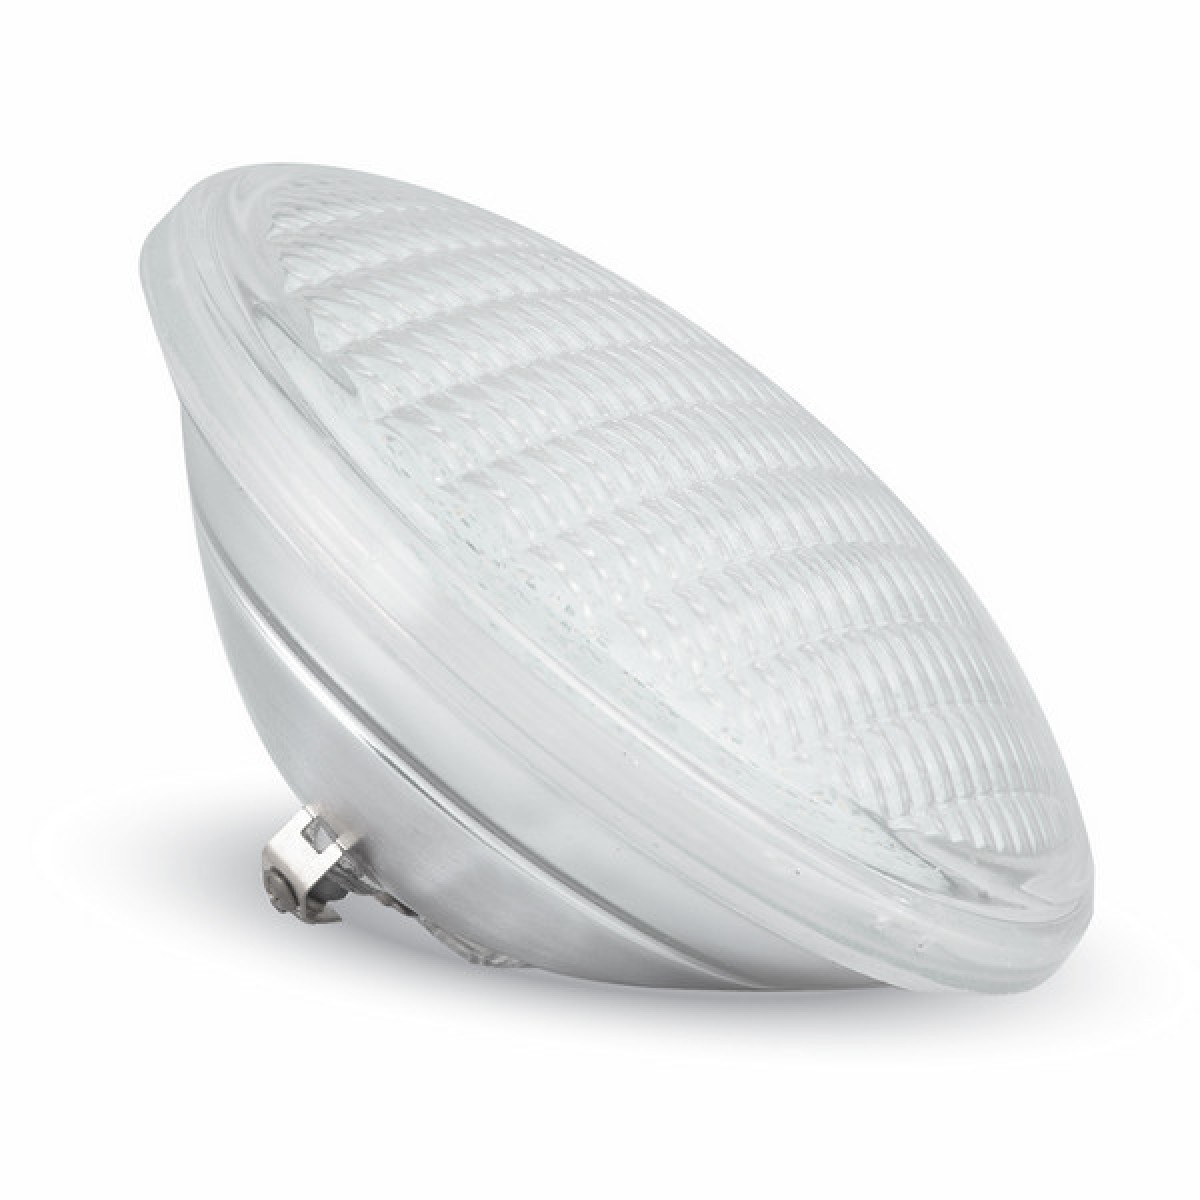 Лампа светодиодная AquaViva SL-P-PAR56-G 360LED SMD White